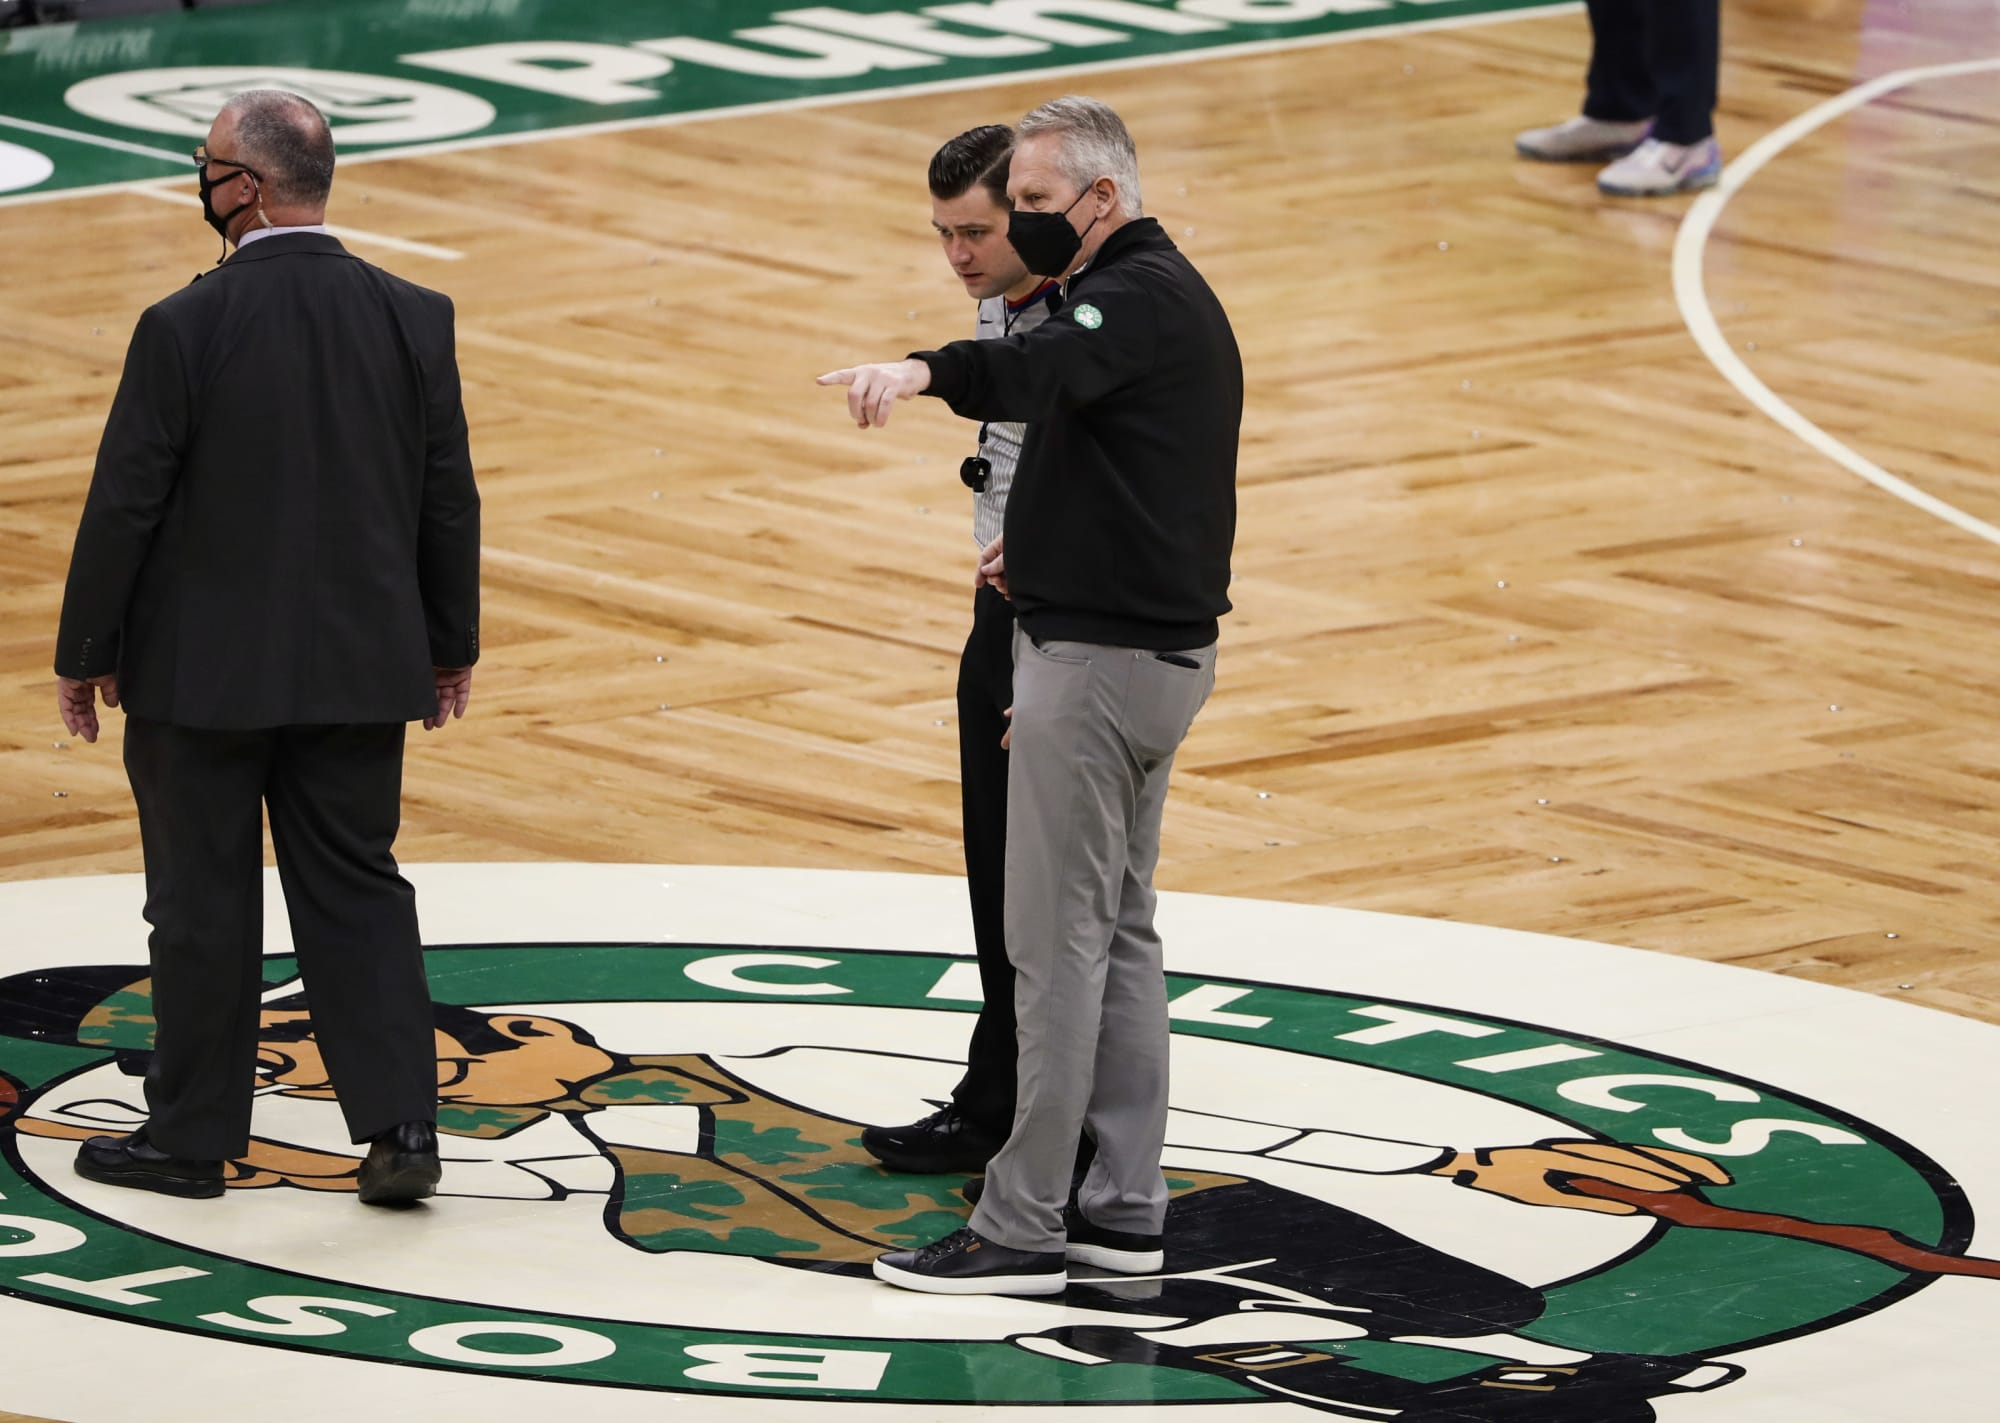 Boston Celtics: Danny Ainge hints offseason roster changes coming